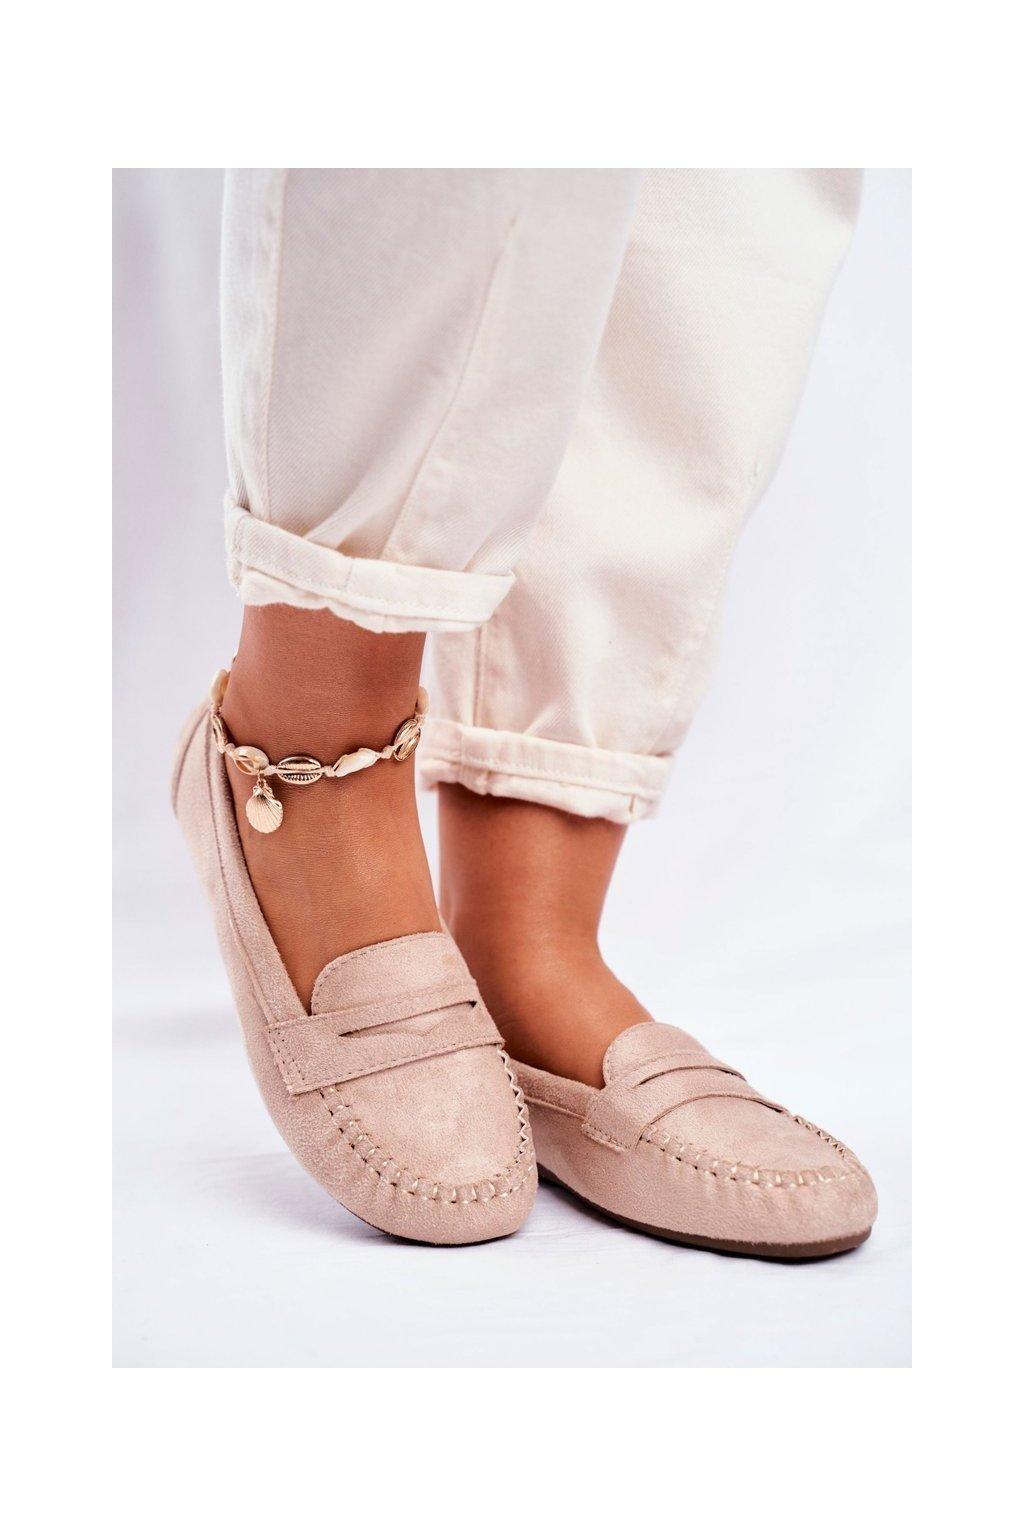 Hnedá obuv NJSK CD-66 BEIGE